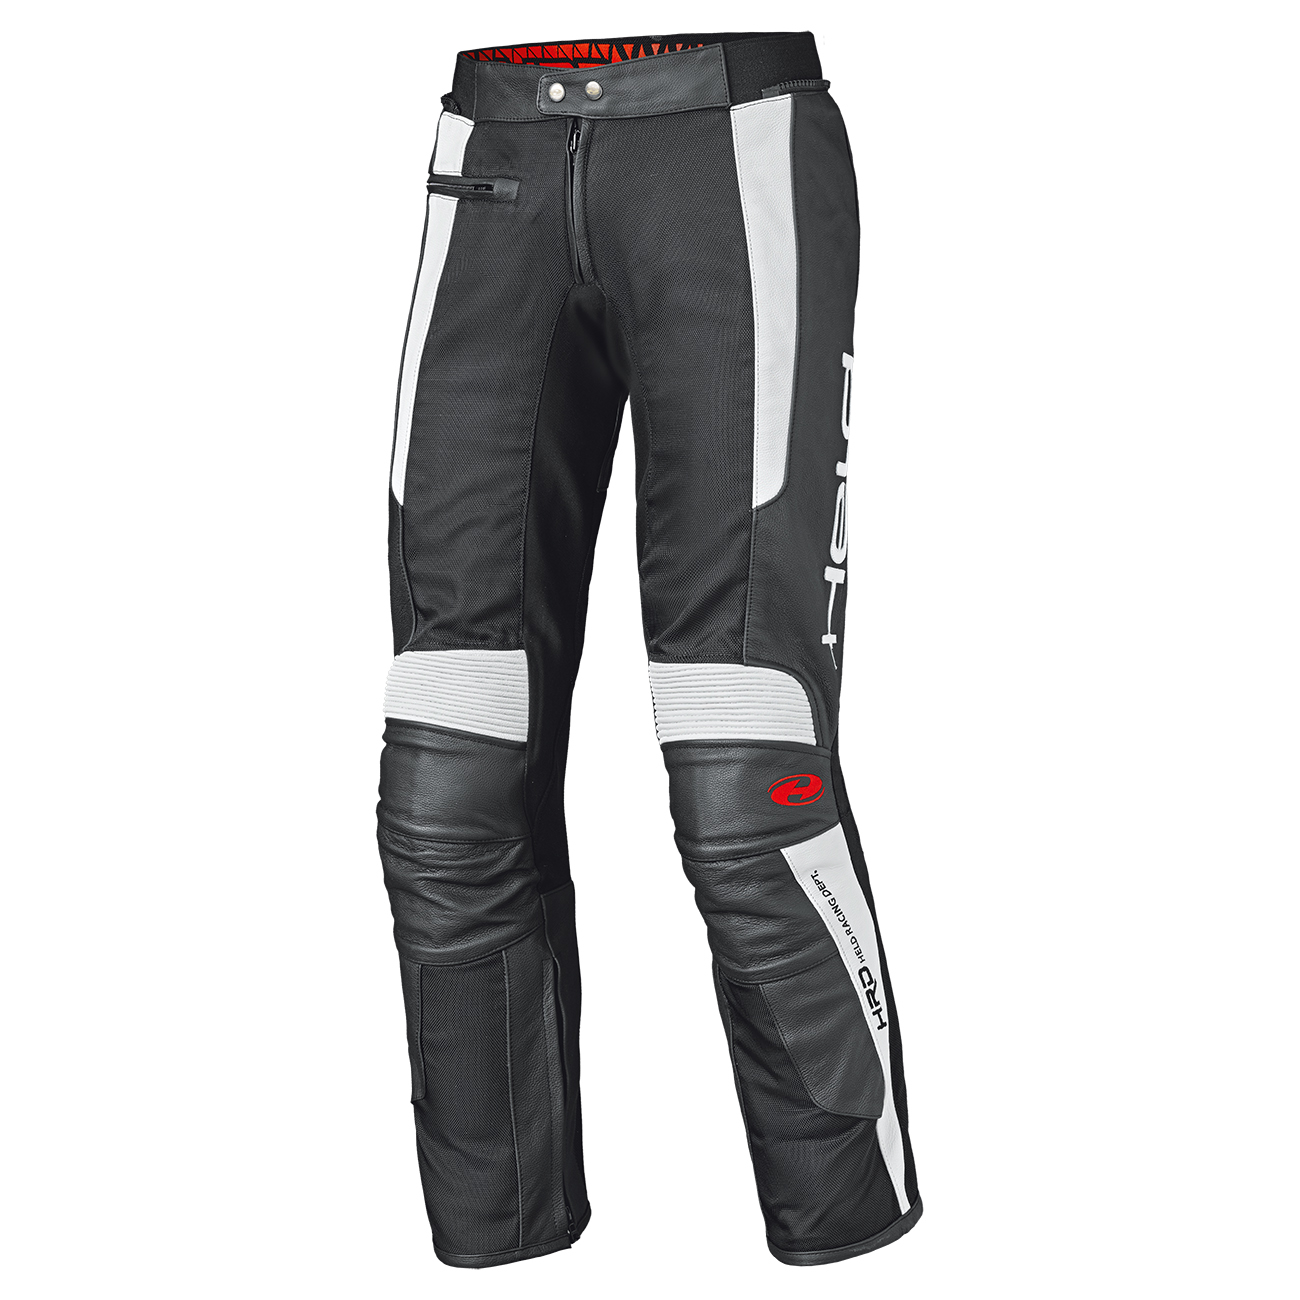 Held Takano II Sport pants